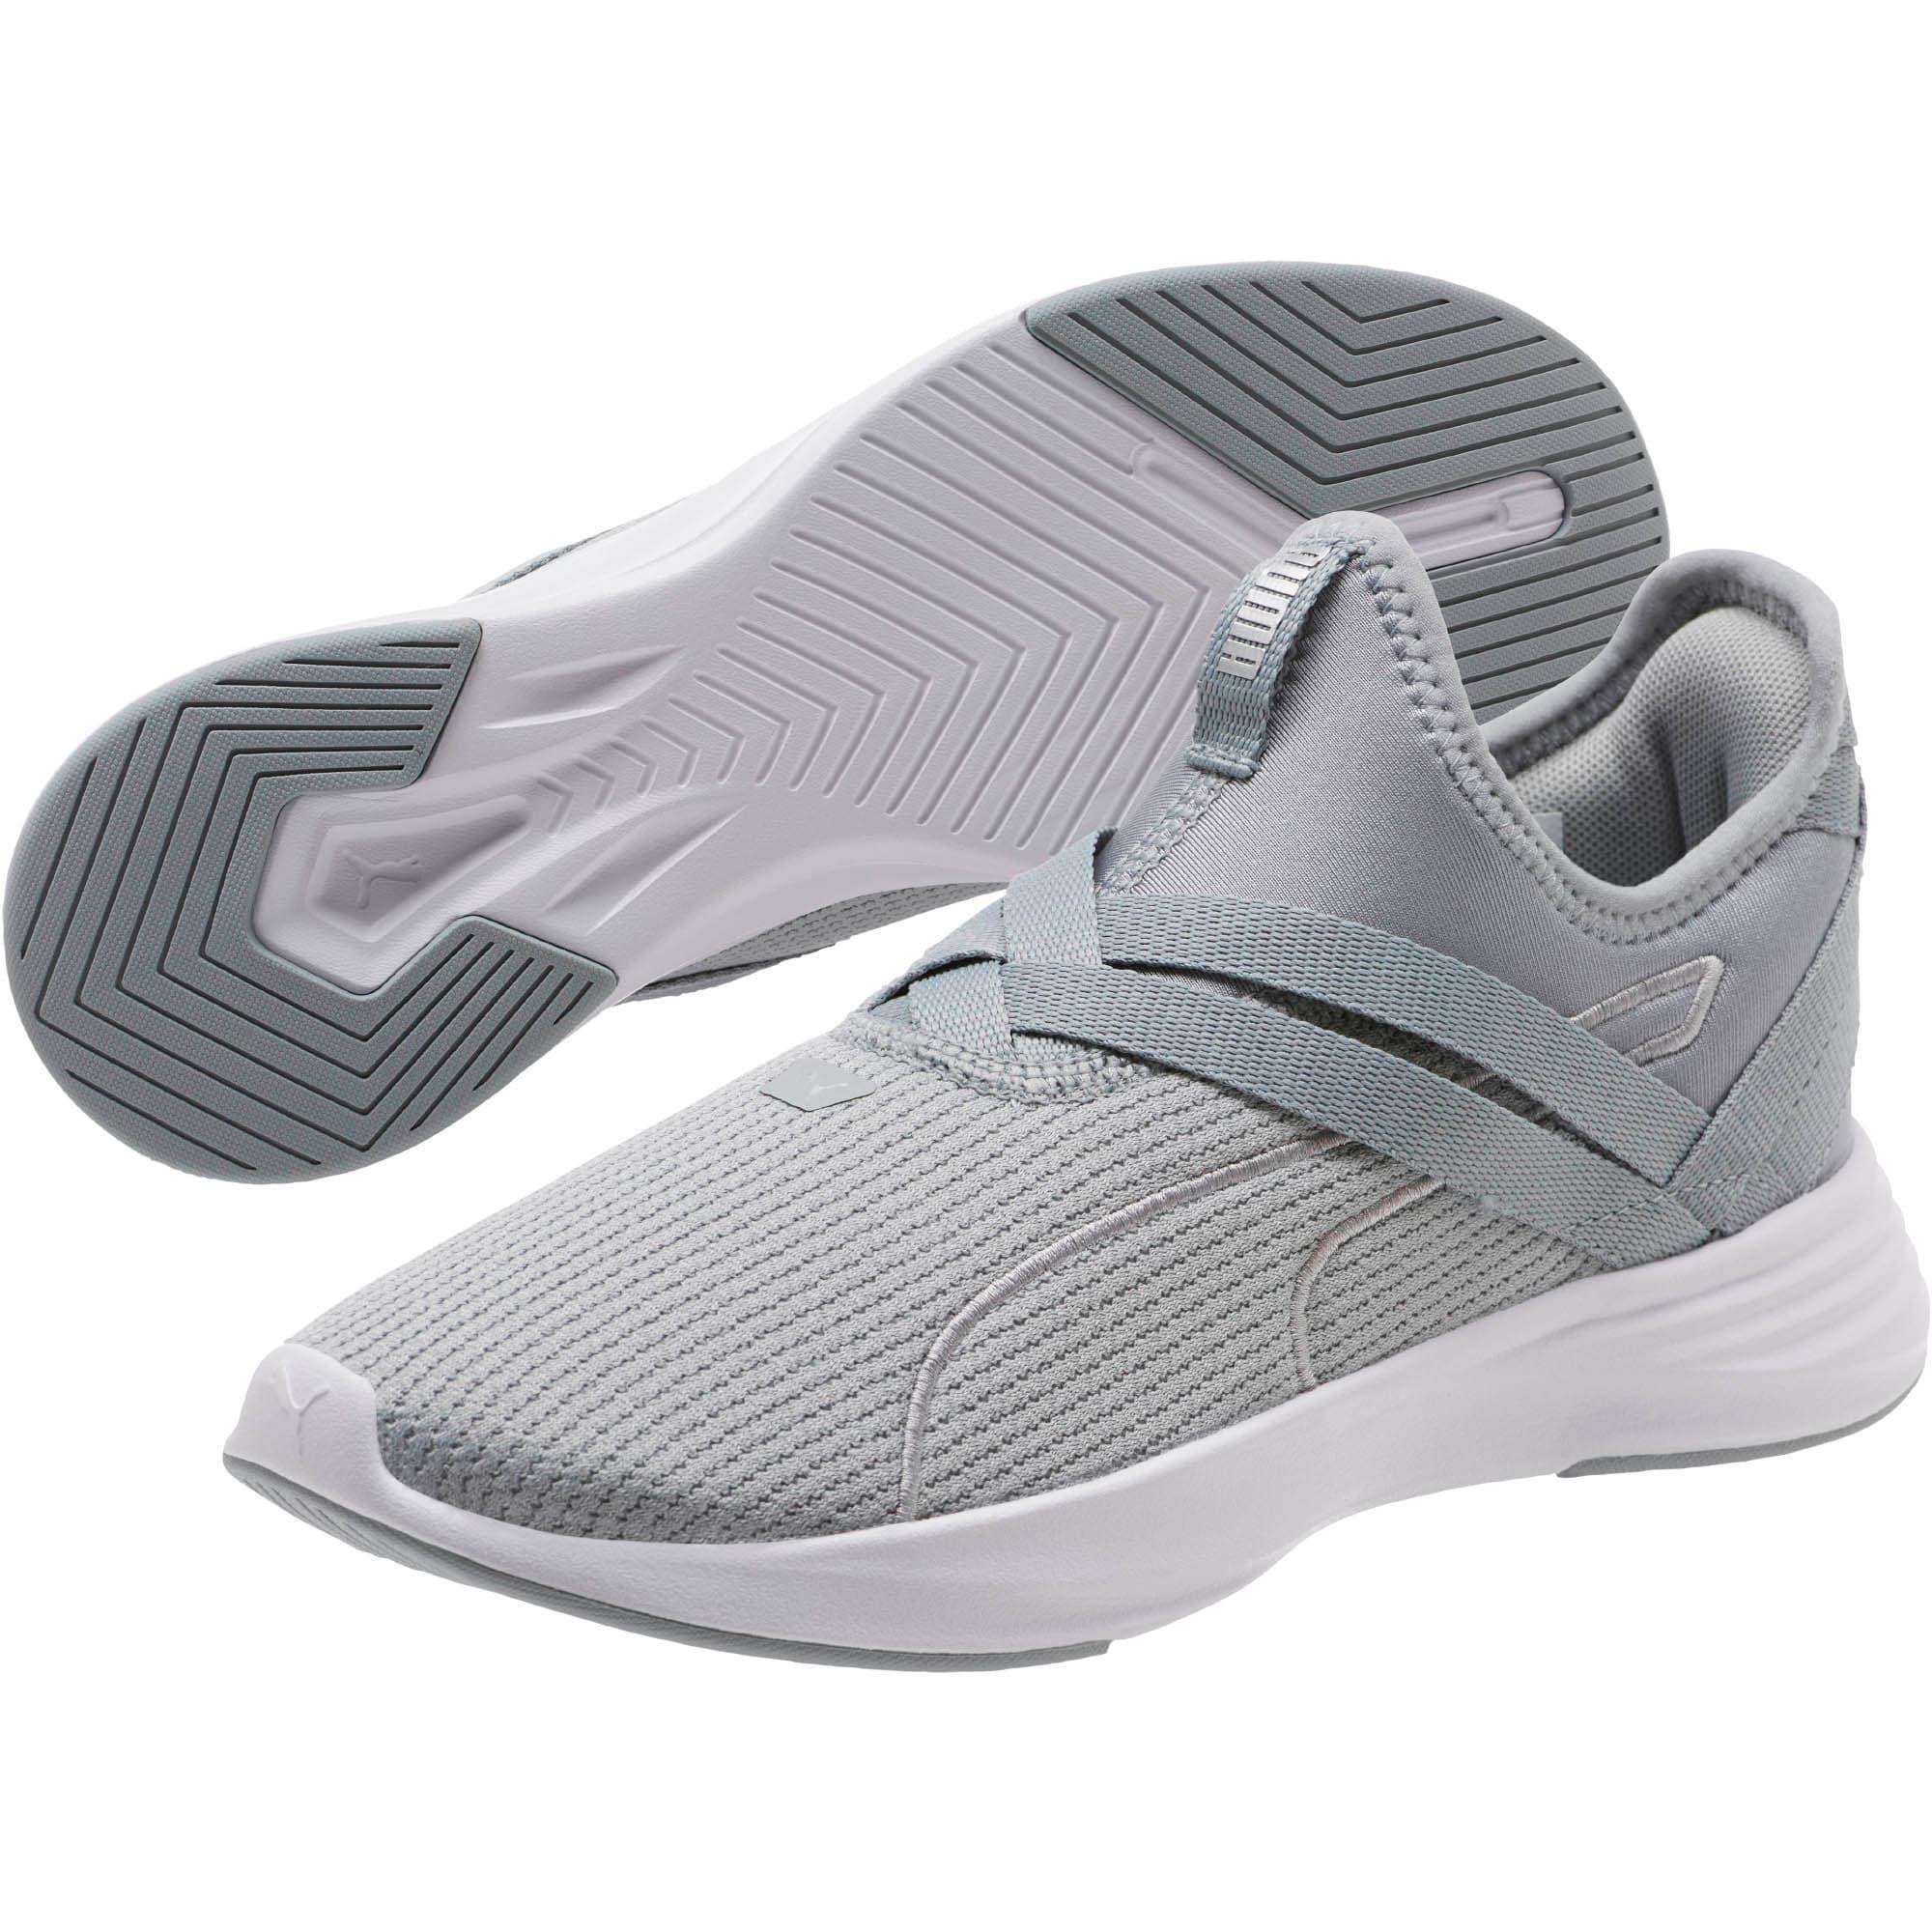 Thumbnail 2 of Radiate XT Slip-On Women's Sneakers, Quarry-Puma Silver, medium